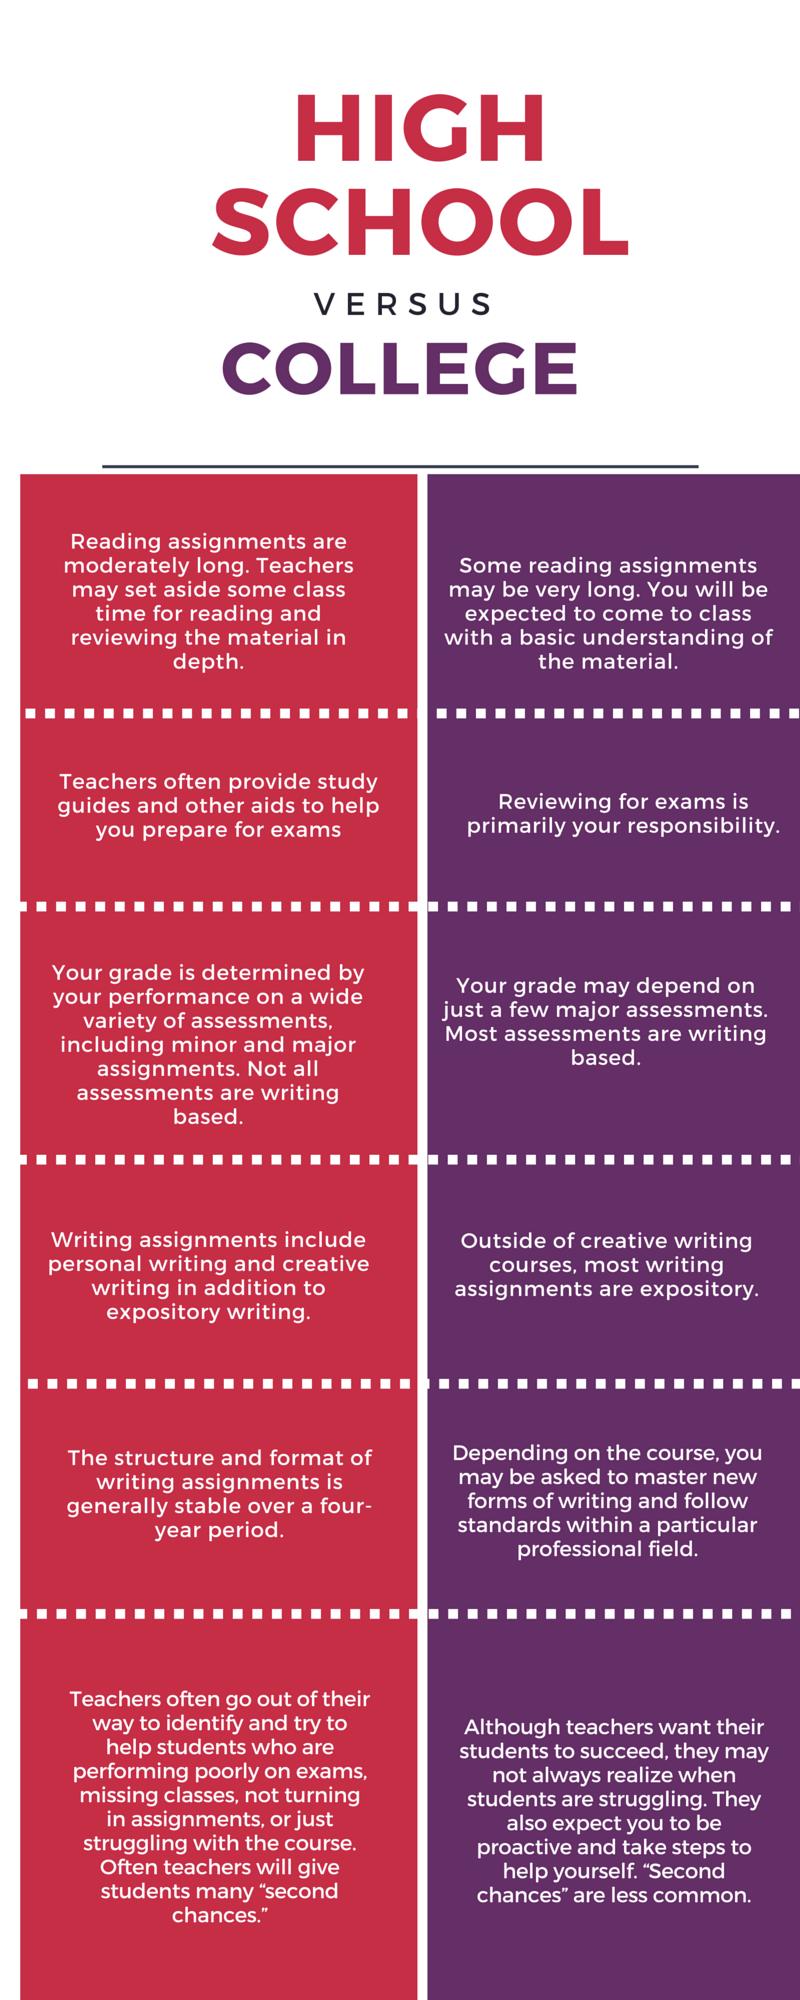 High school vs. college infographic